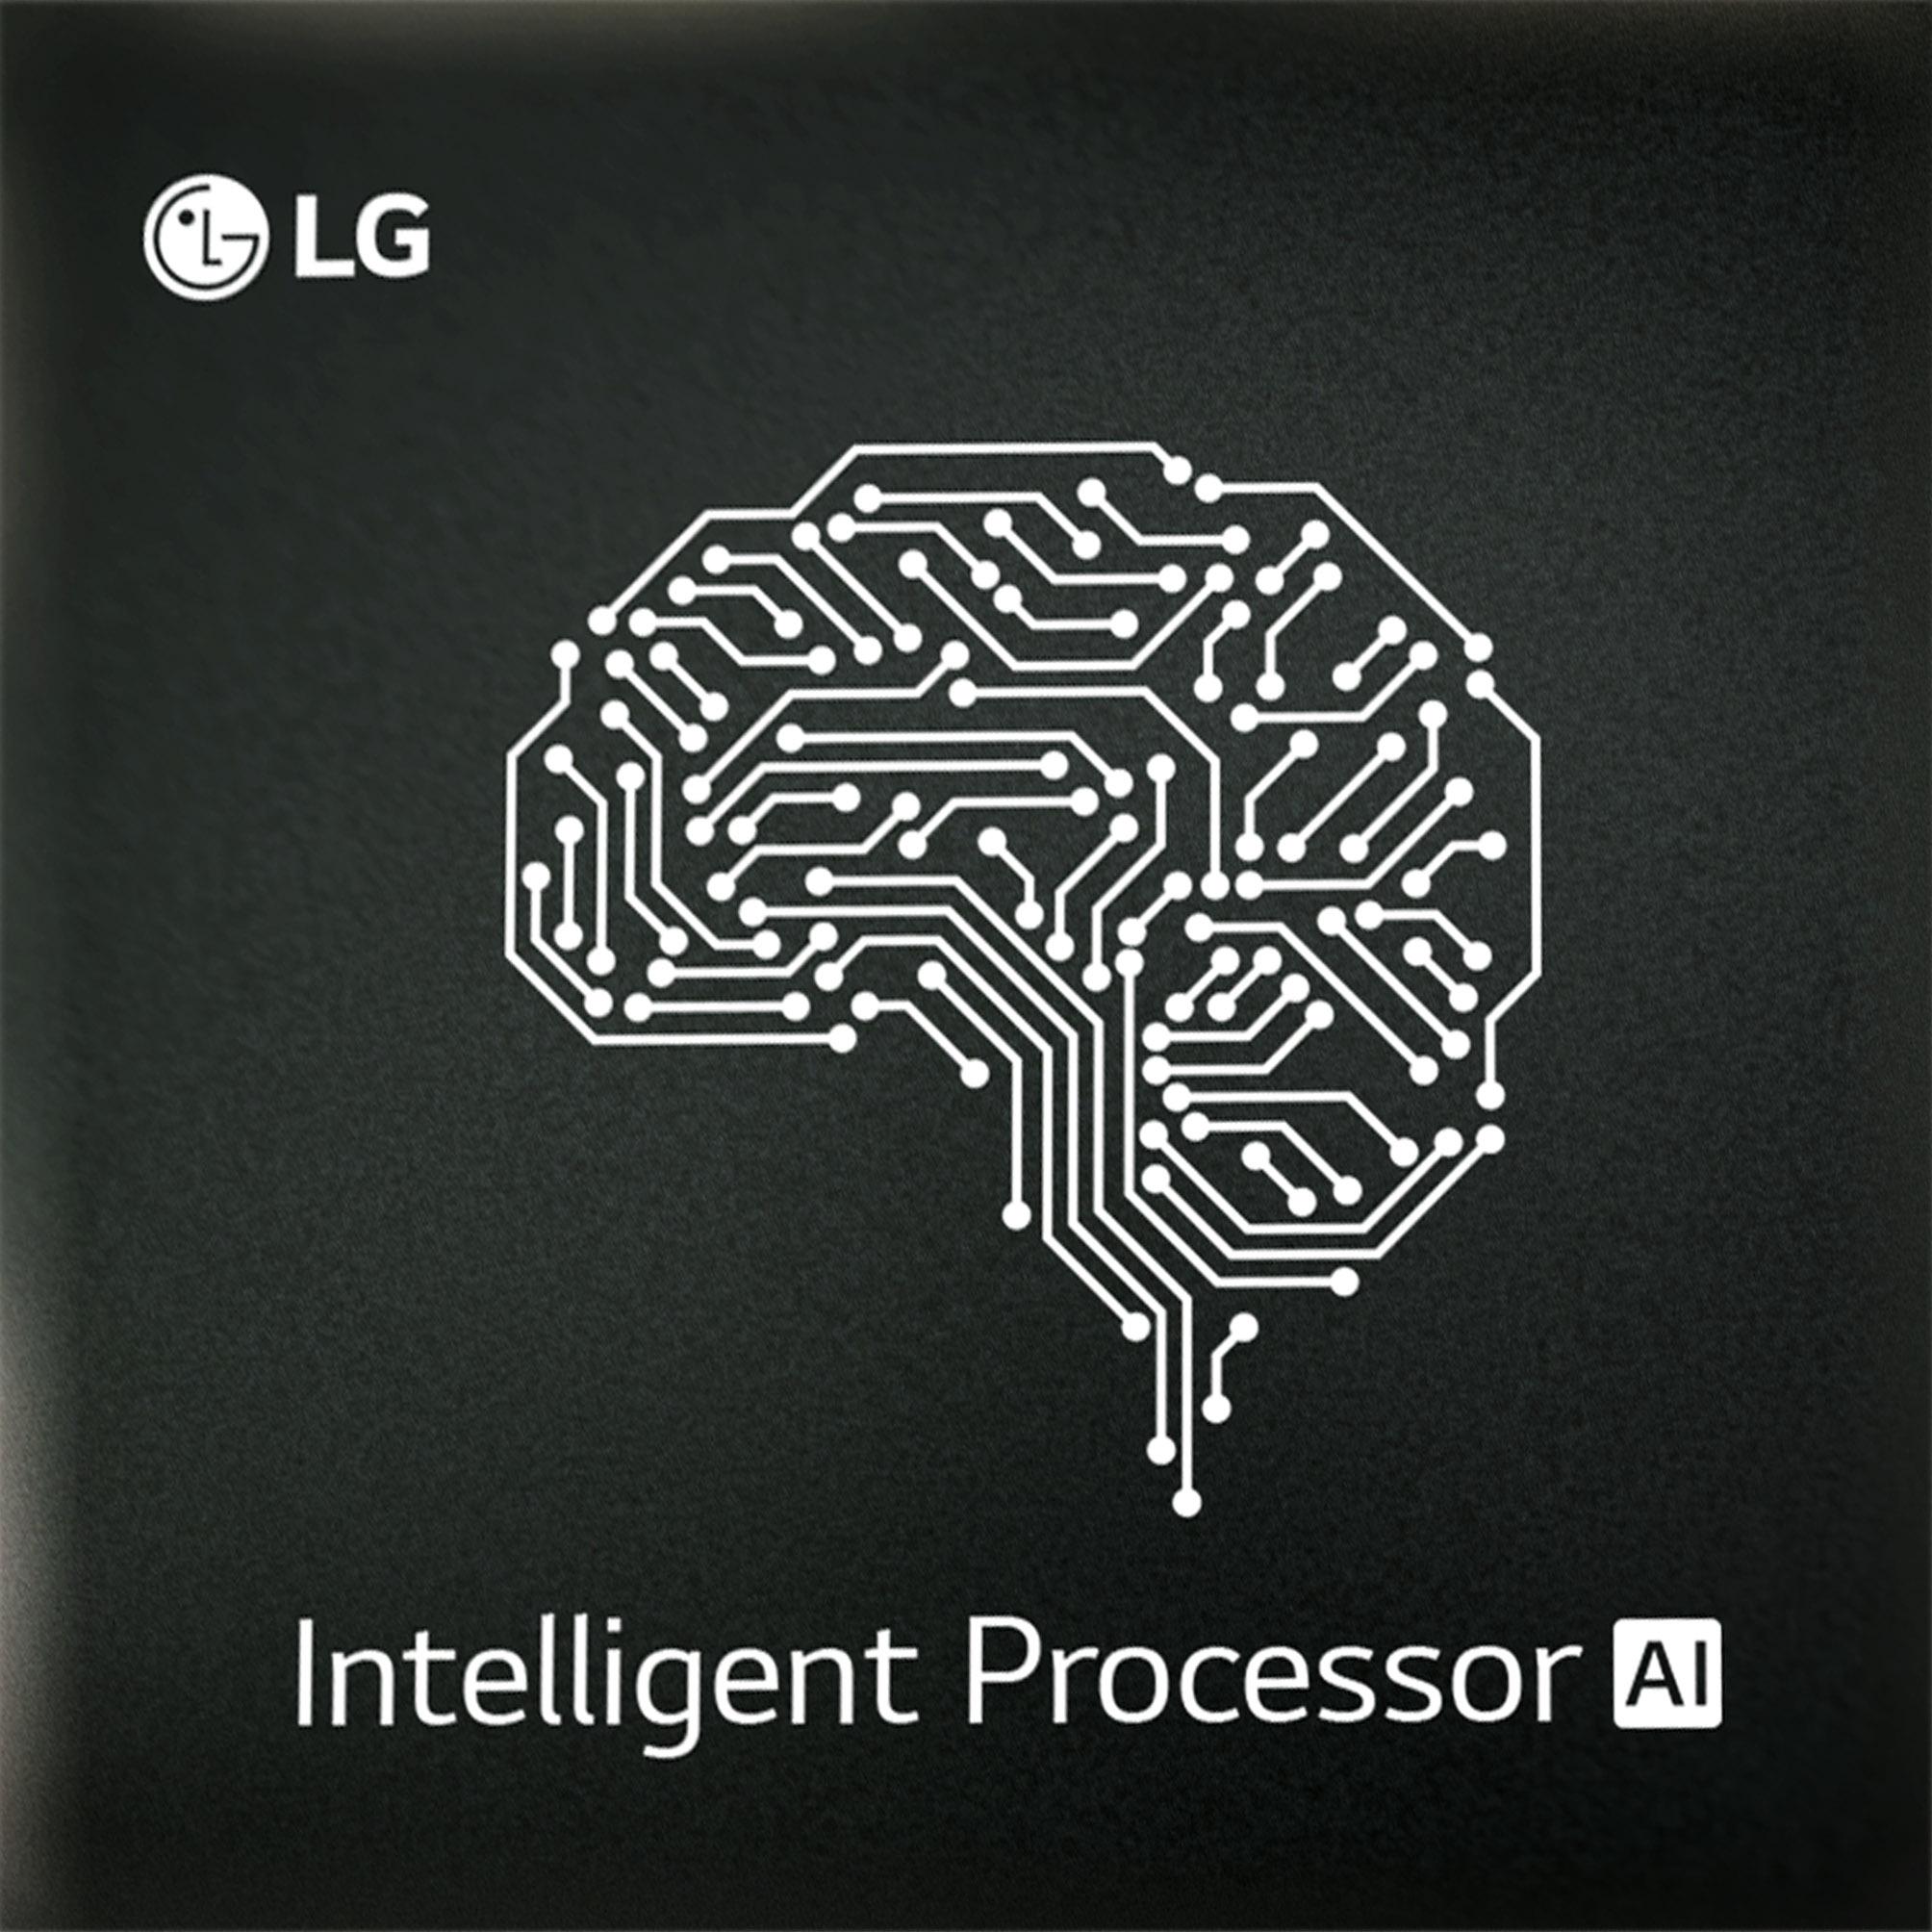 LG전자가 로봇청소기, 세탁기, 냉장고, 에어컨 등 다양한 제품에 범용으로 사용할 수 있는 'AI칩(Artificial Intelligence Chip)'을 독자개발했습니다.